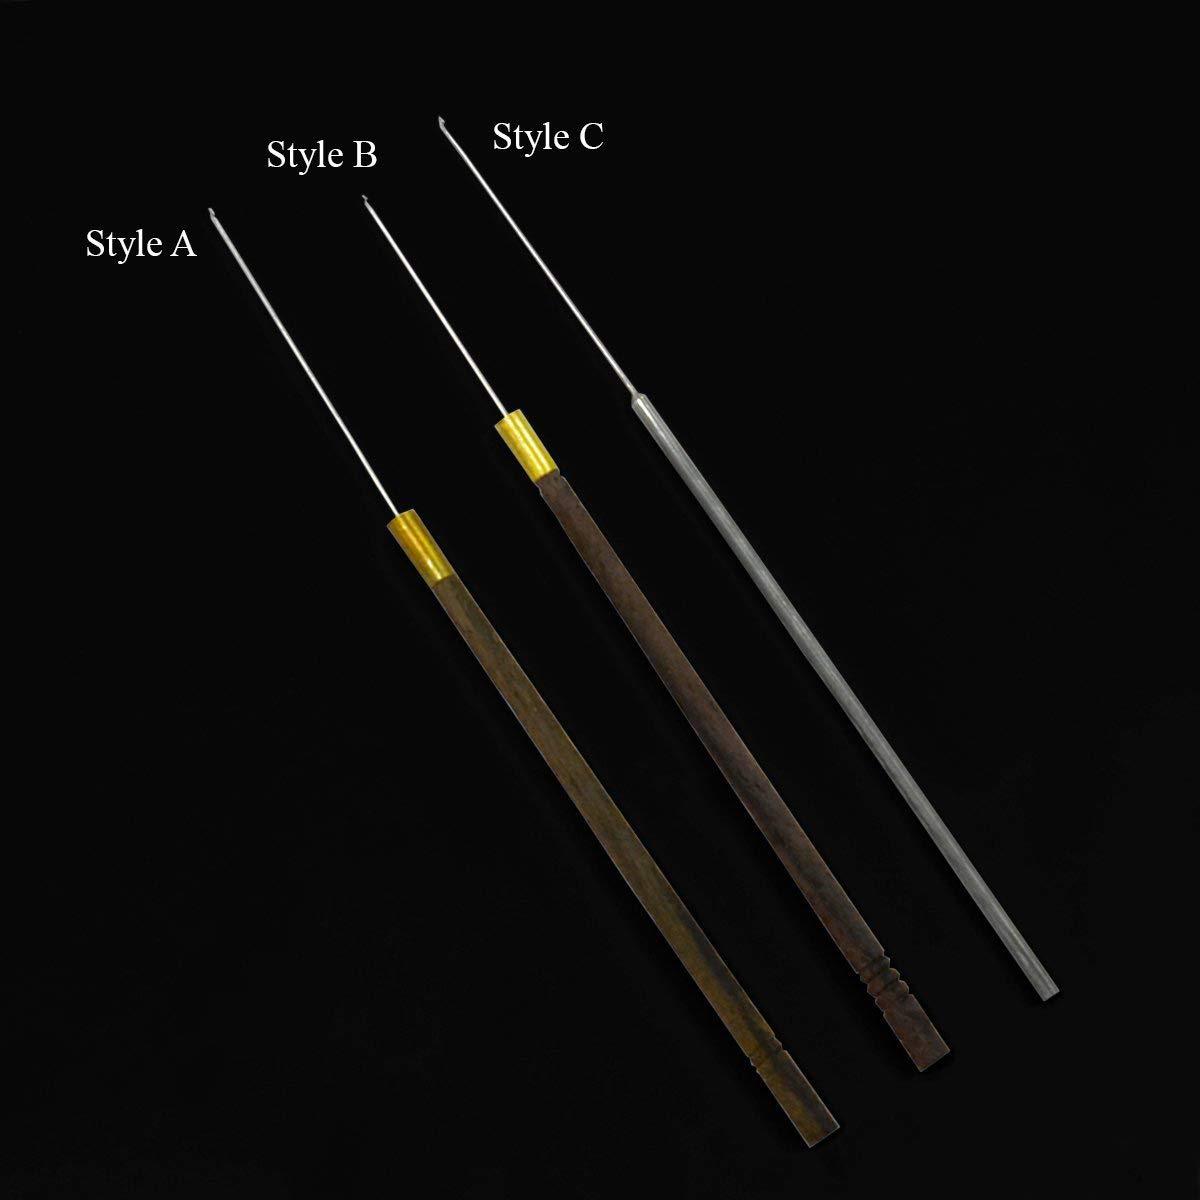 250g CHENGYIDA 50 DIFFERENT COLOR Wool Fibre Needle Felting Felting Needles Starter Kits Mat Tools